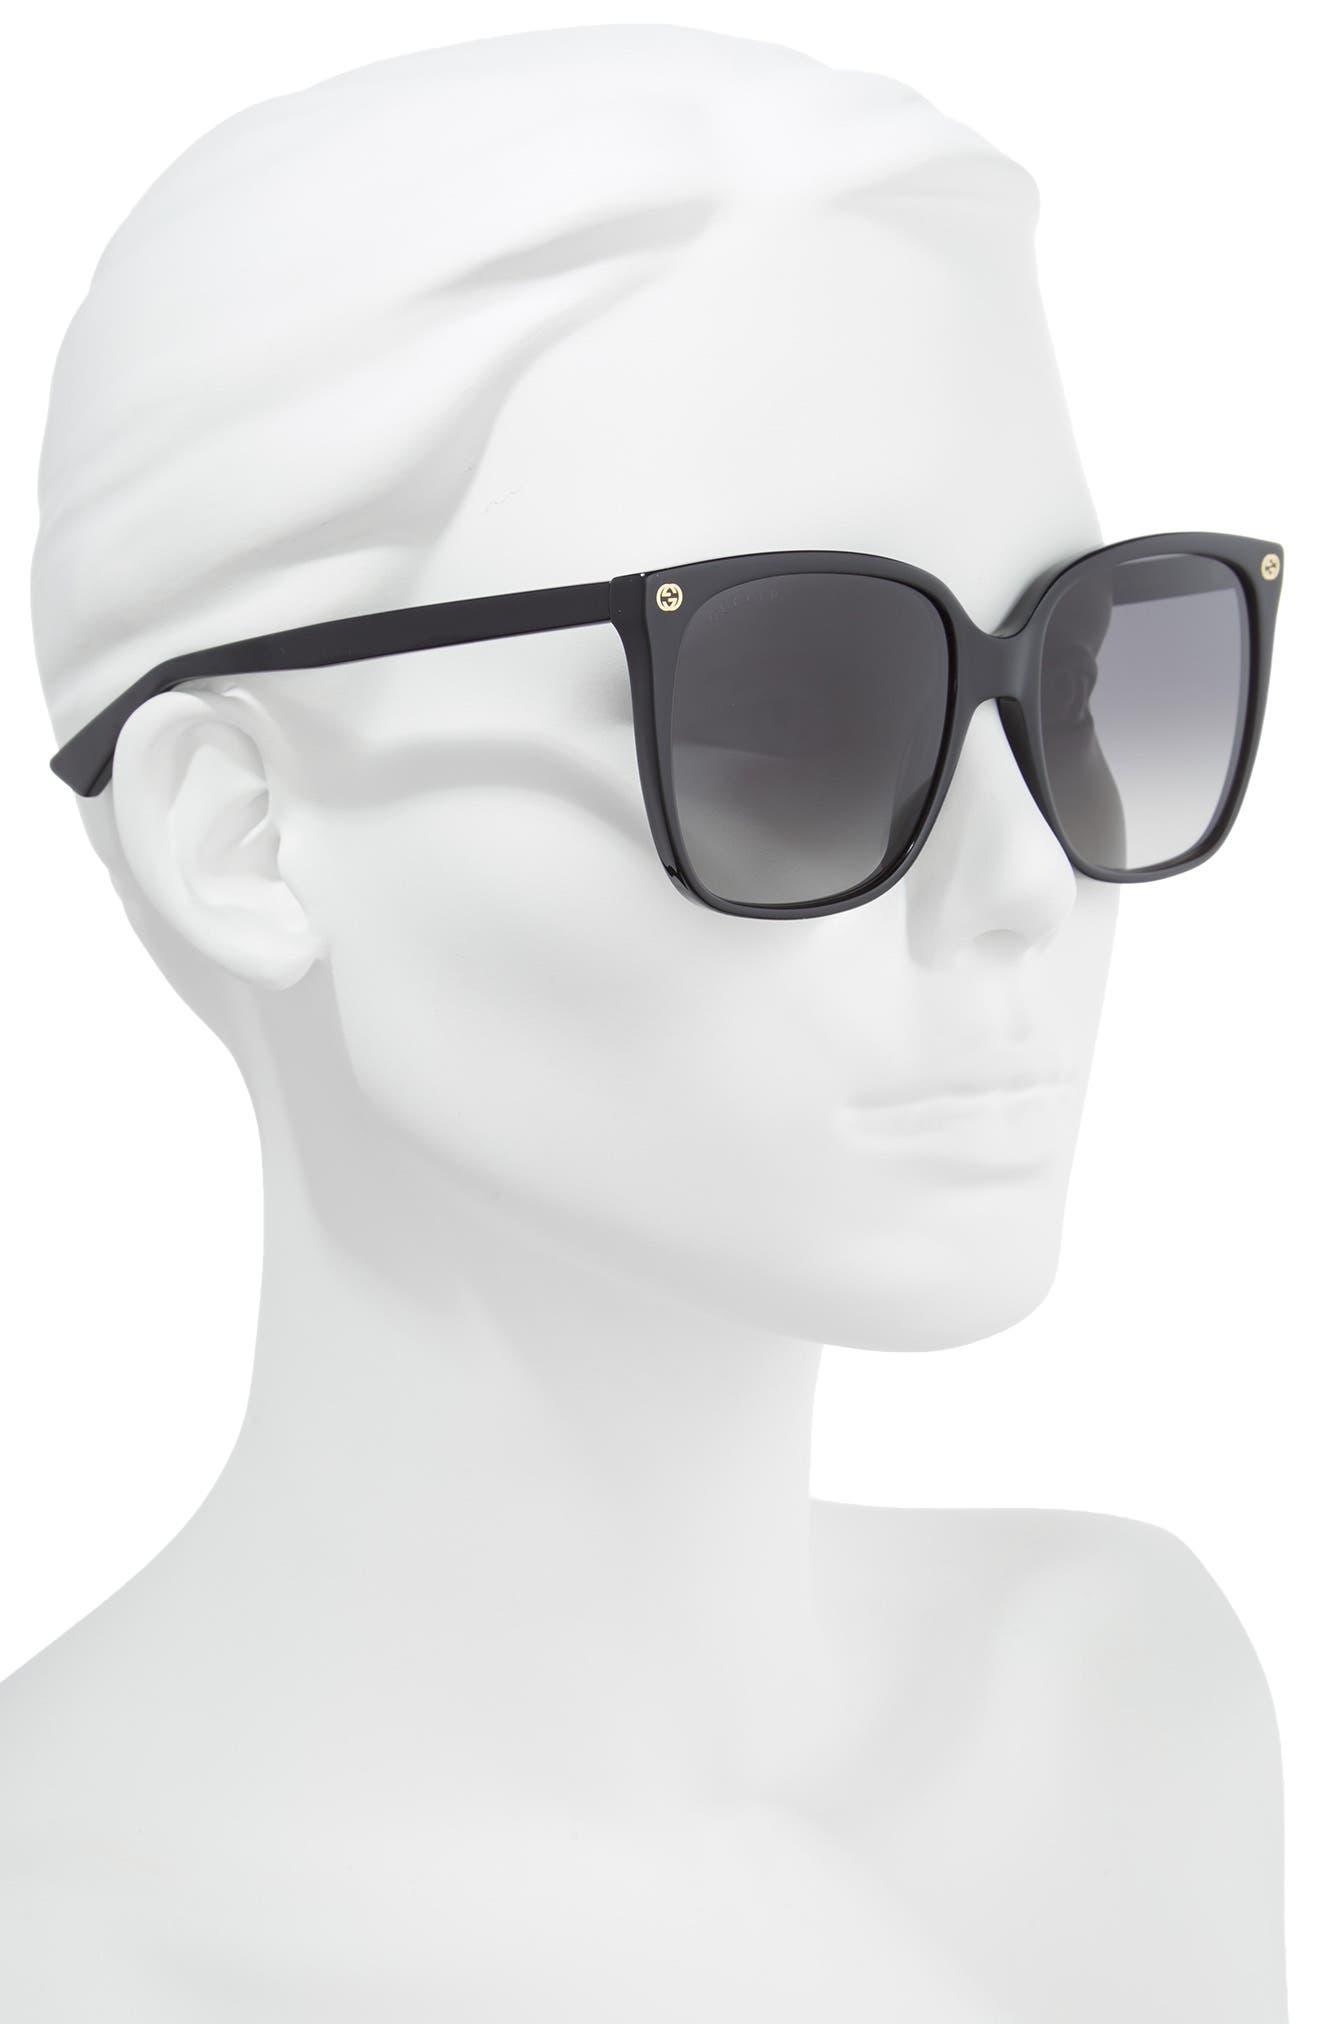 57mm Square Sunglasses,                             Alternate thumbnail 2, color,                             007